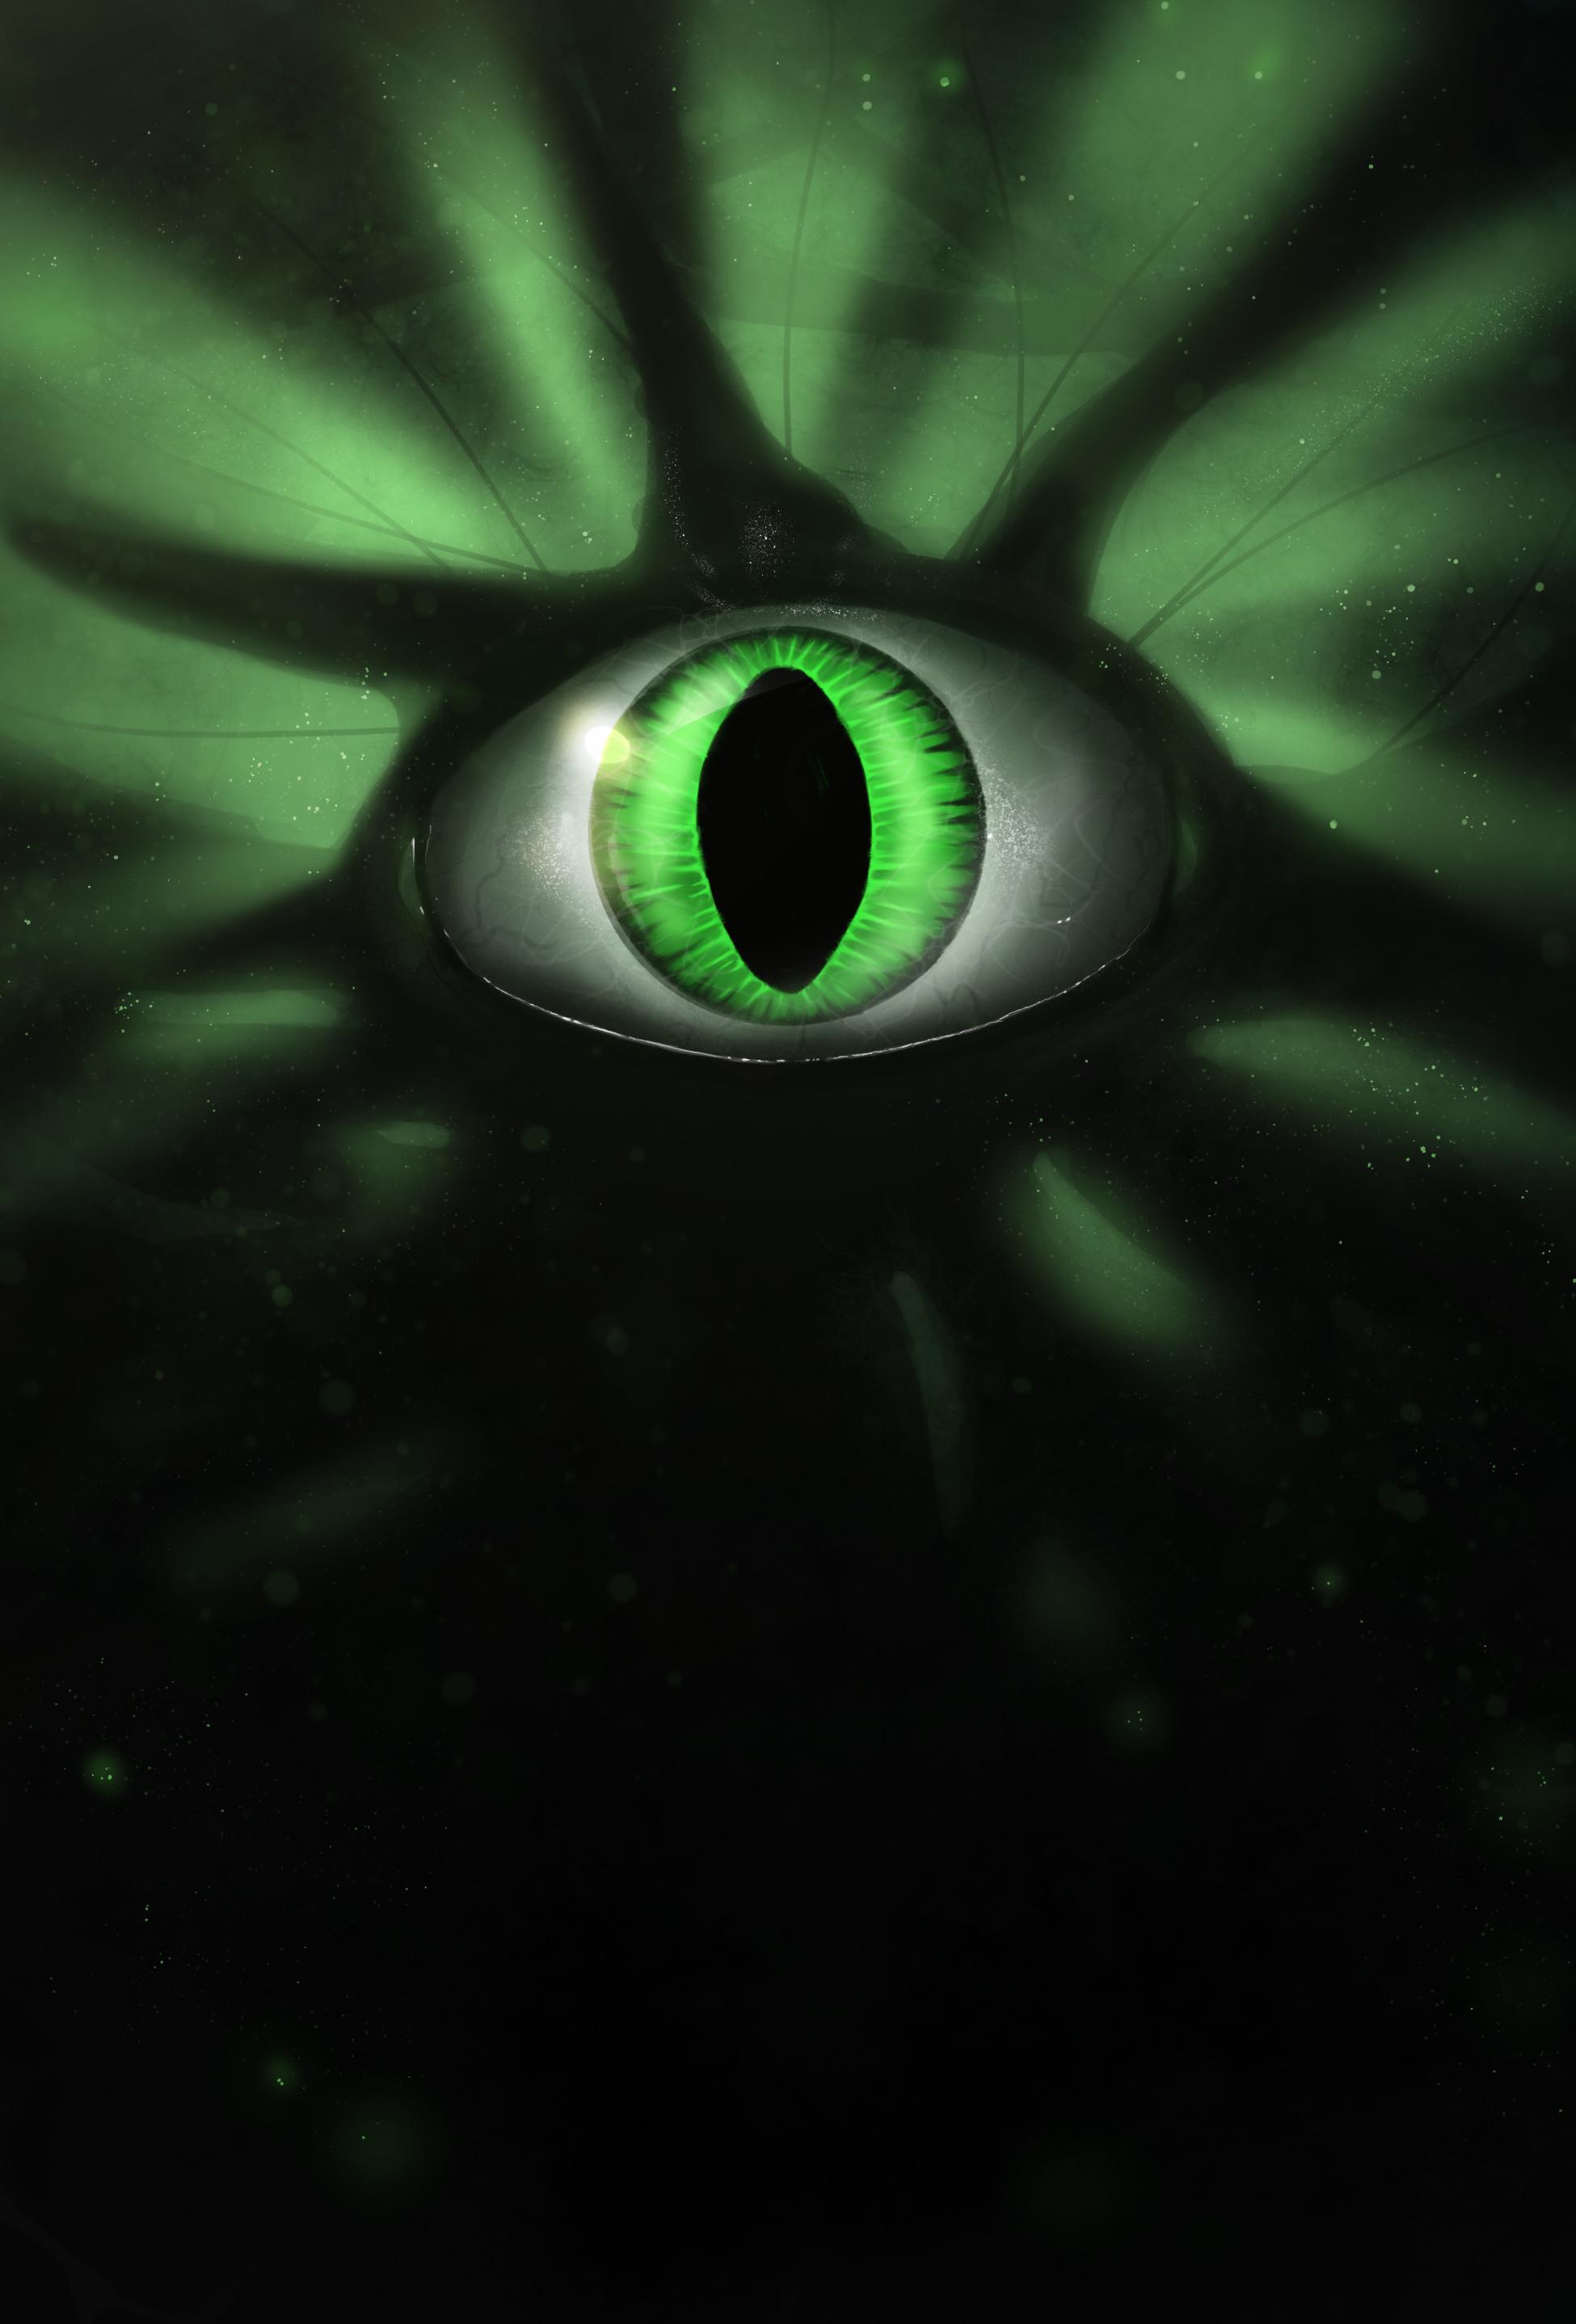 intuentis's eye